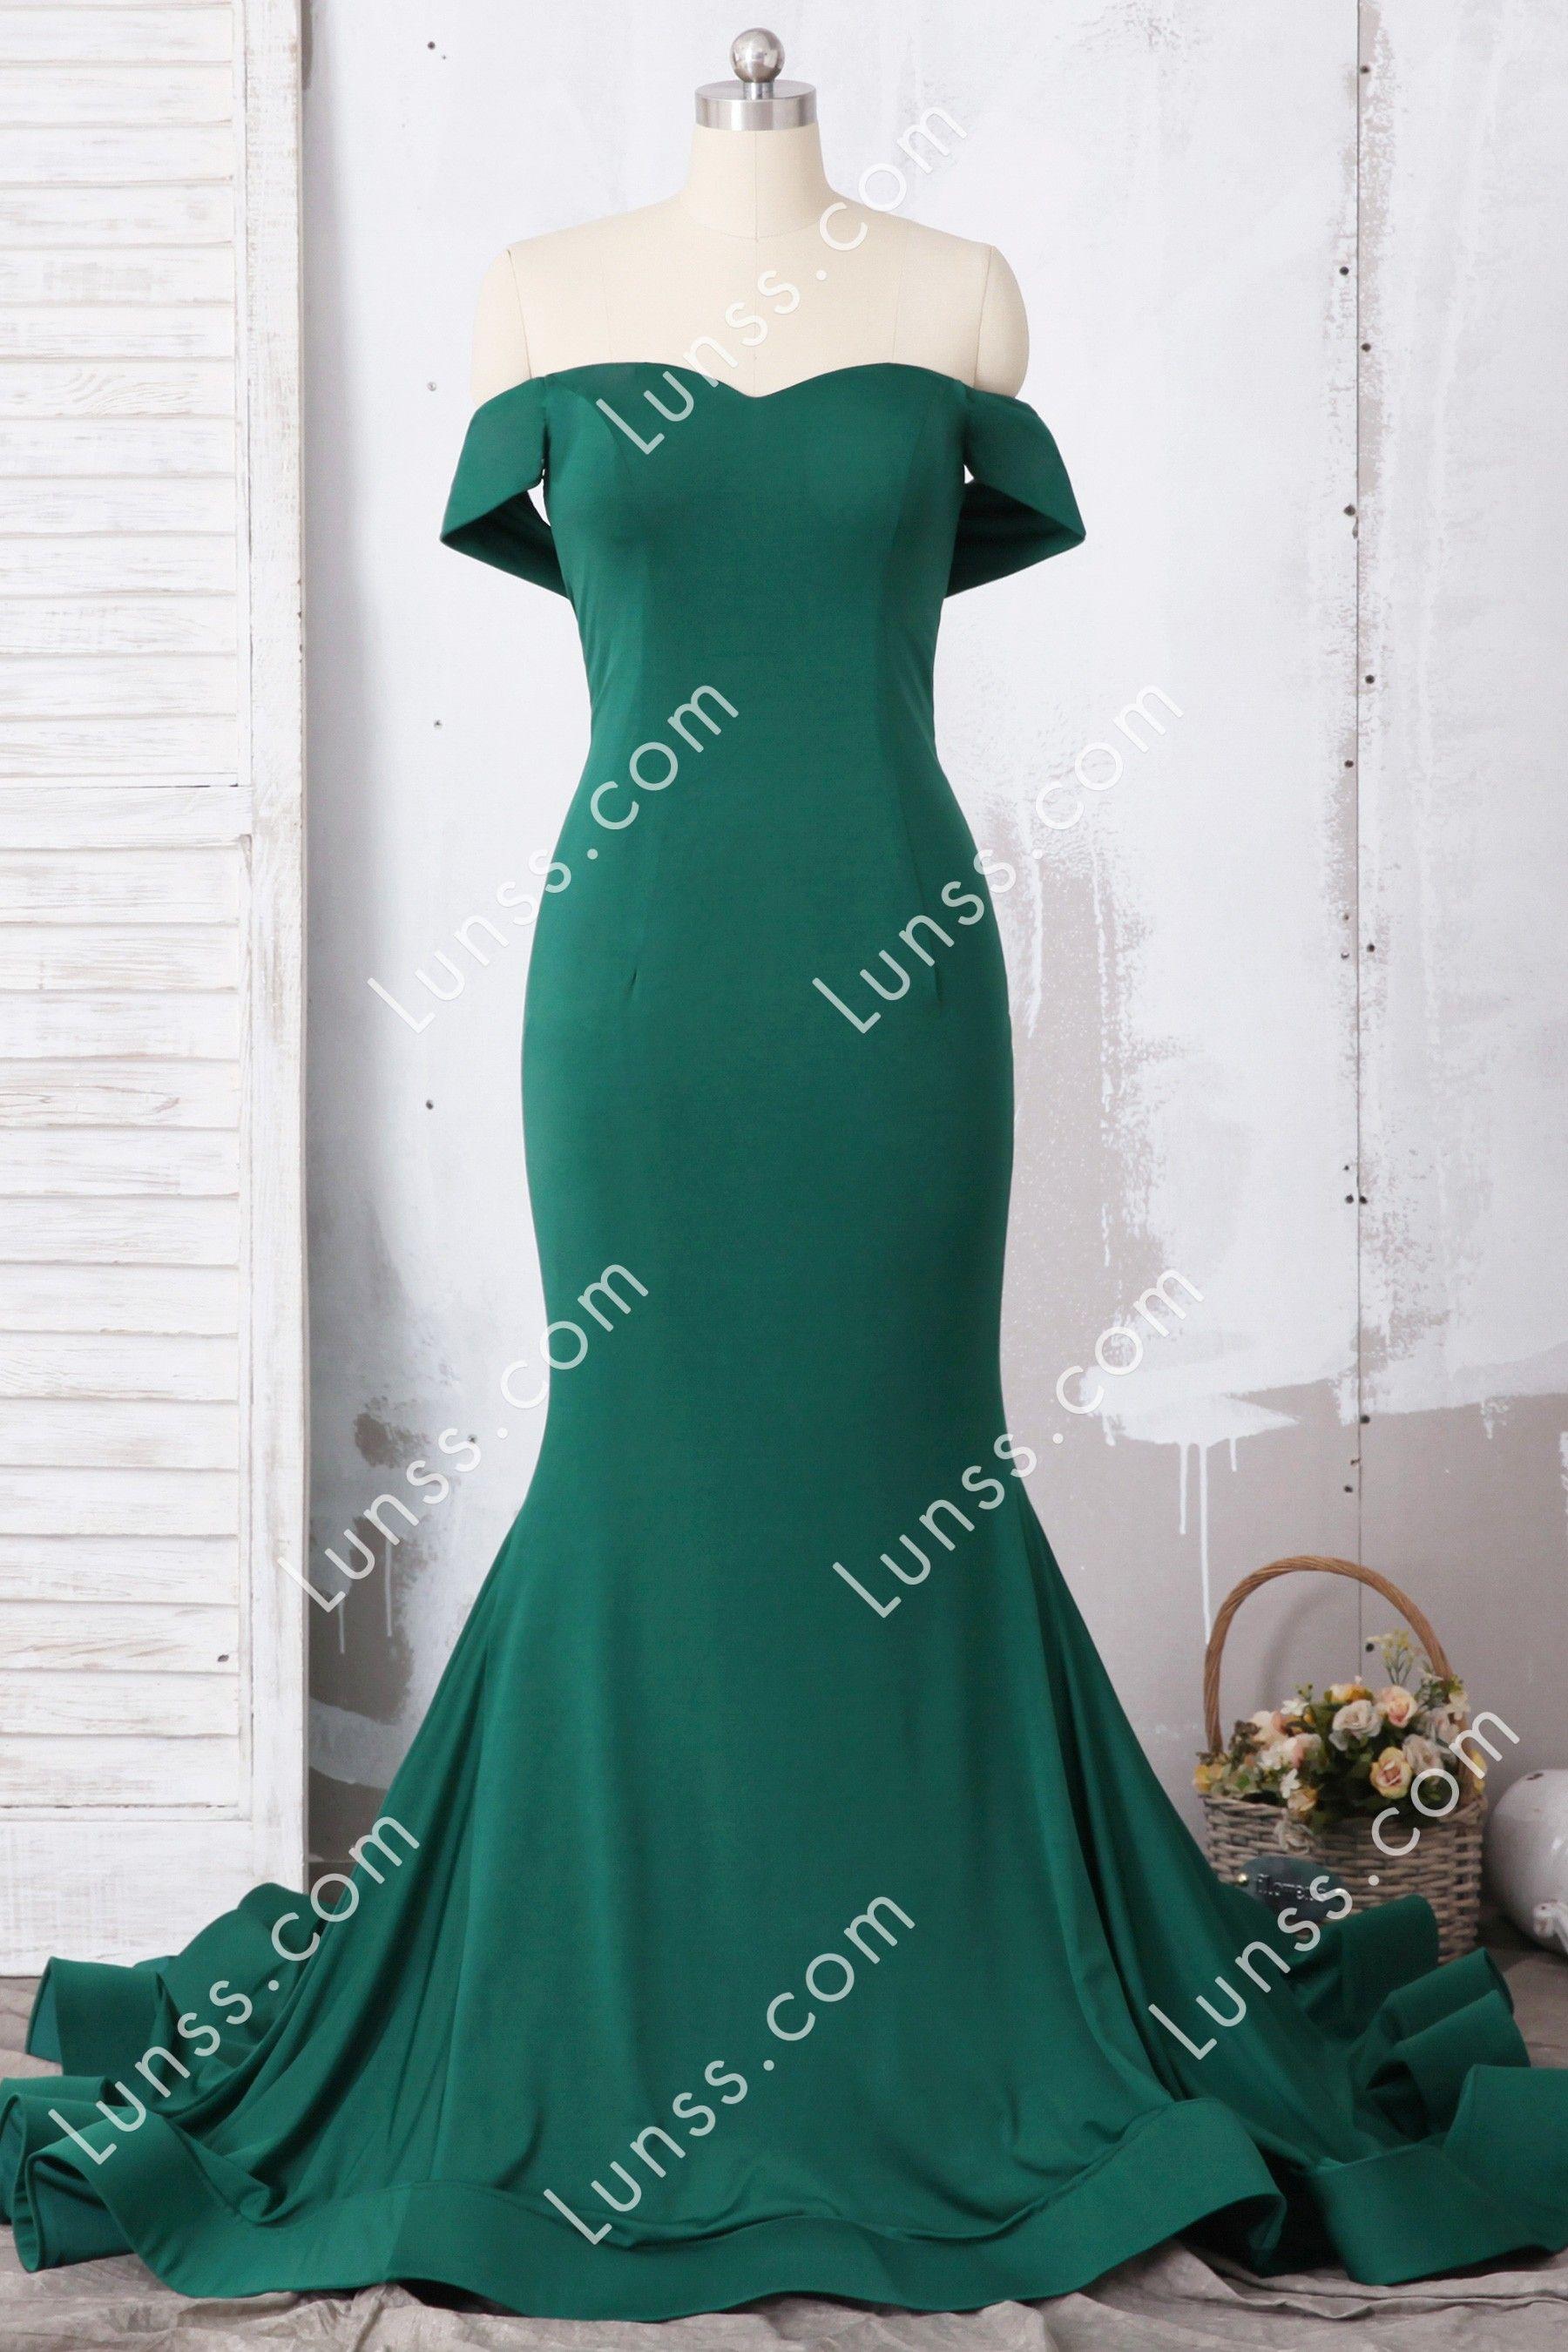 Custom Emerald Off The Shoulder Mermaid Prom Dress Green Prom Dress Emerald Green Prom Dress Mermaid Prom Dresses [ 2700 x 1800 Pixel ]